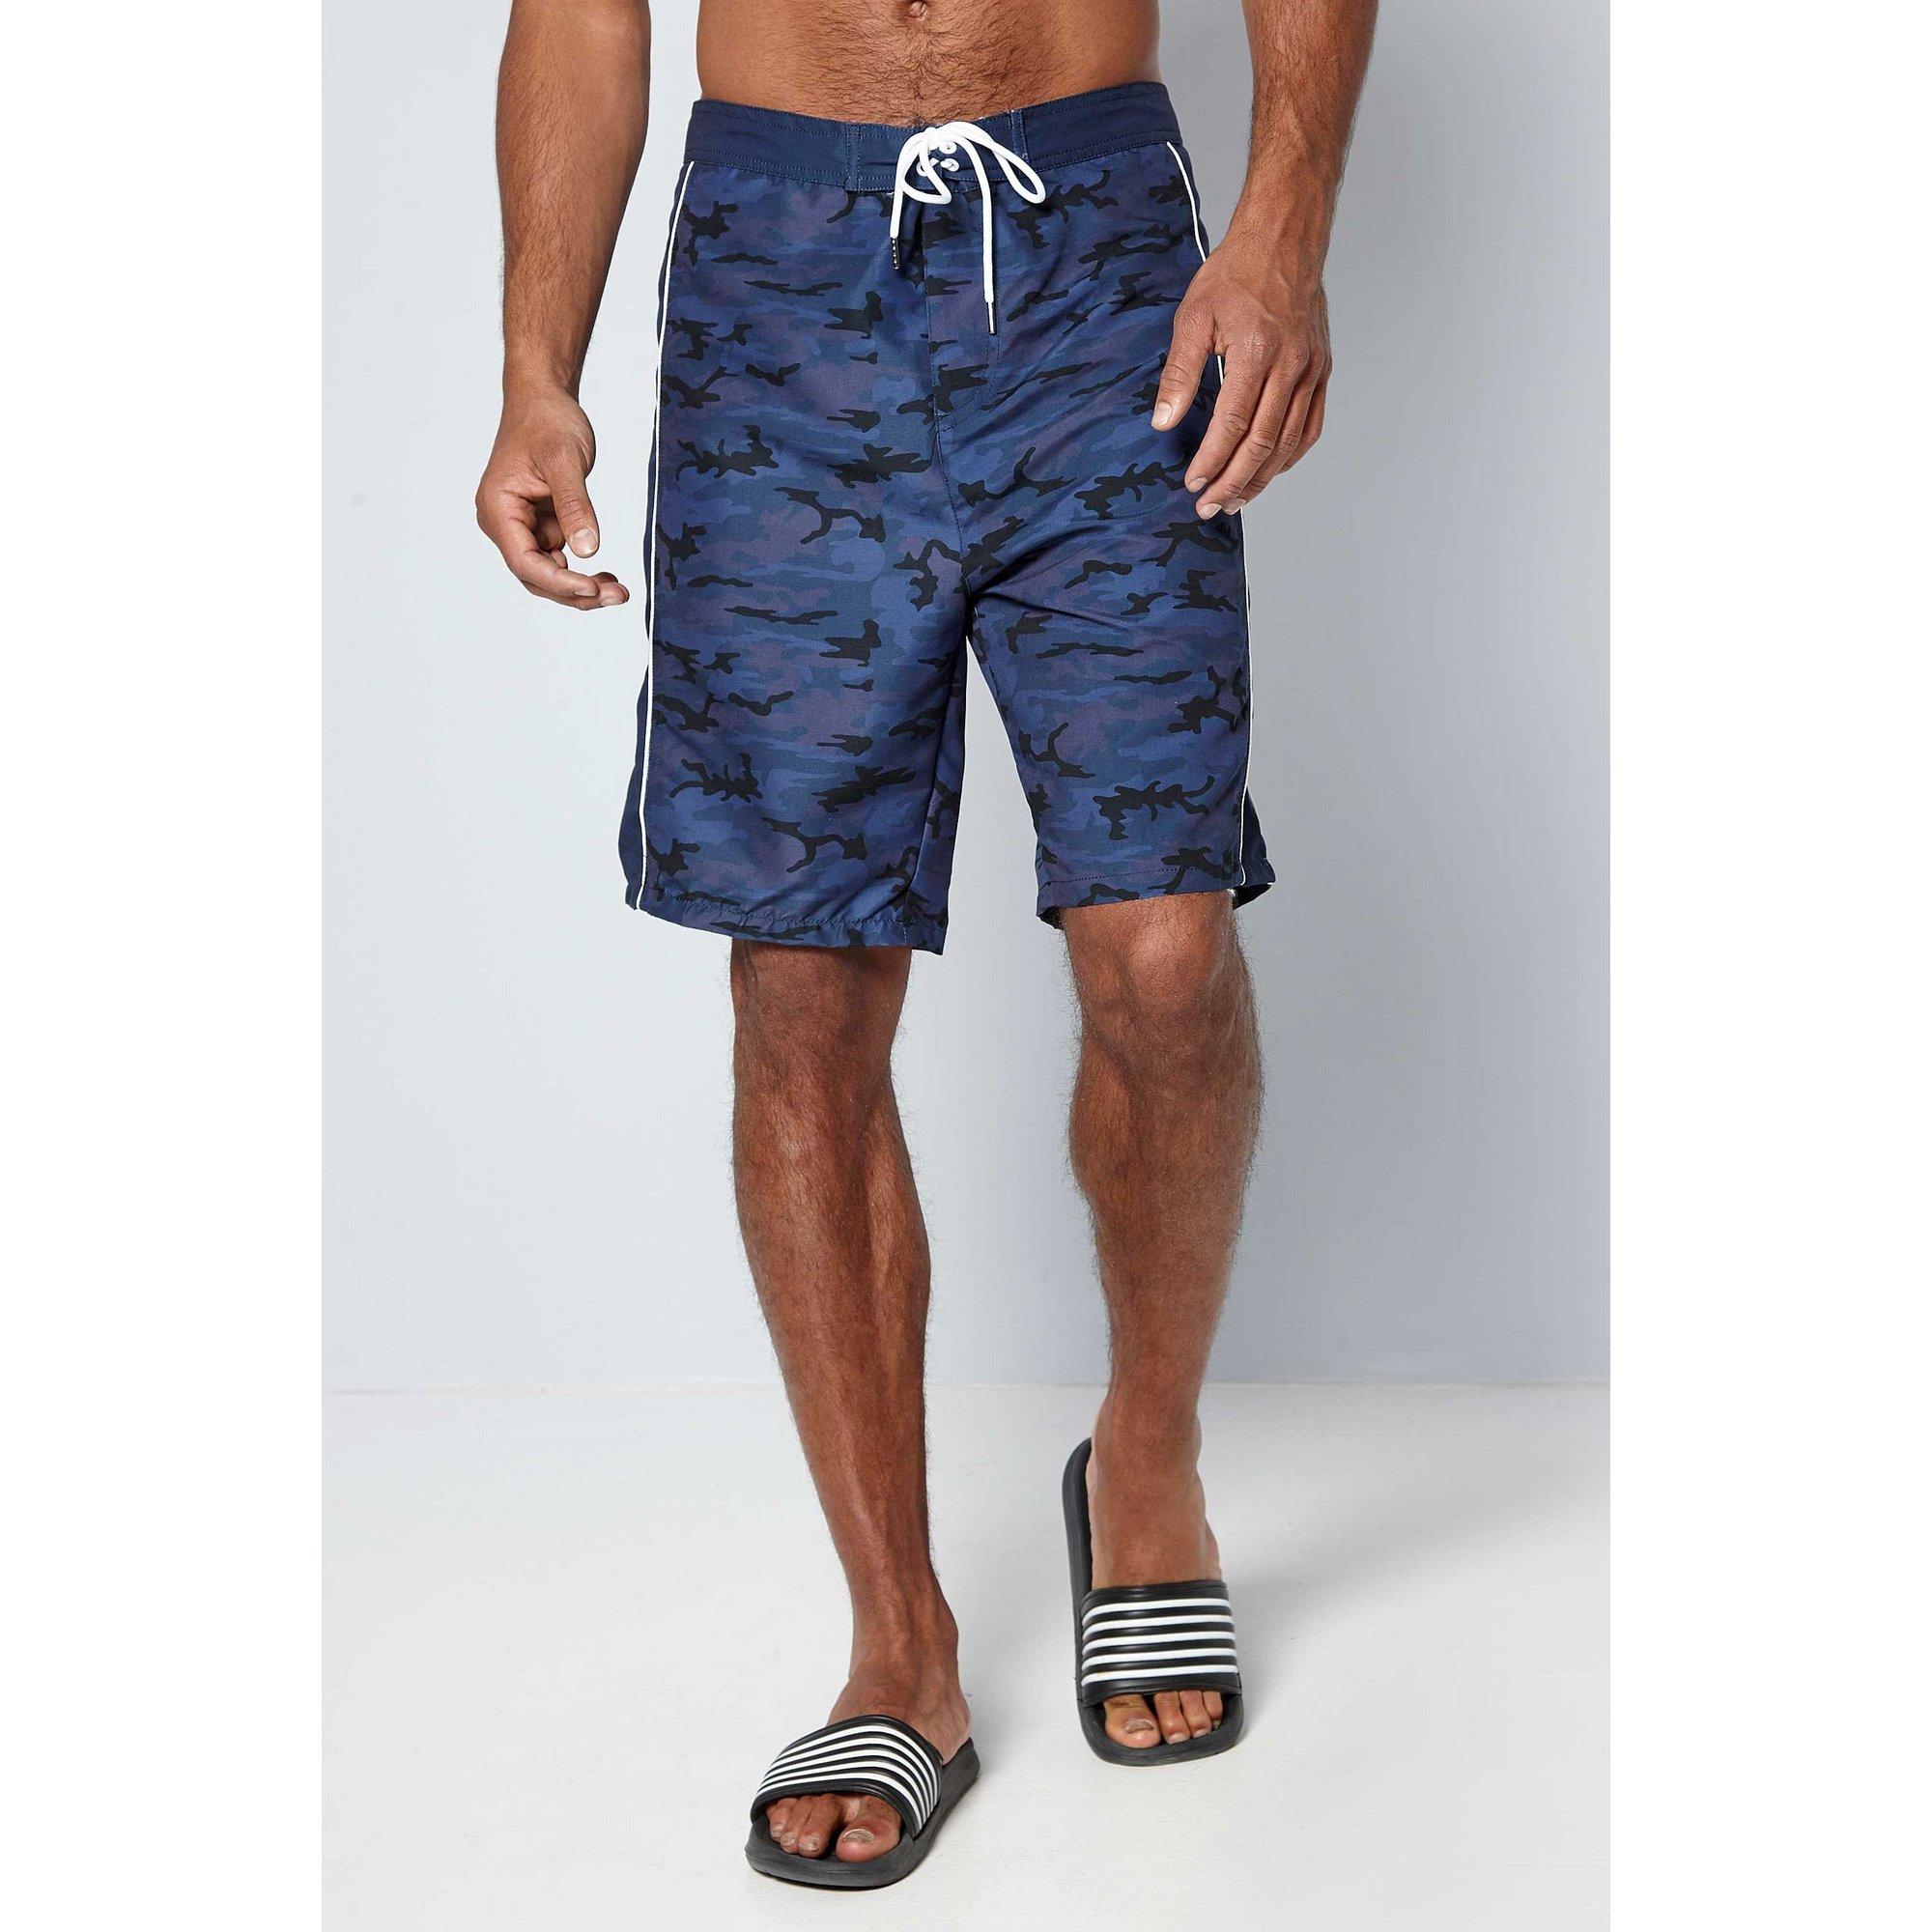 Image of Camo Print Board Swim Shorts